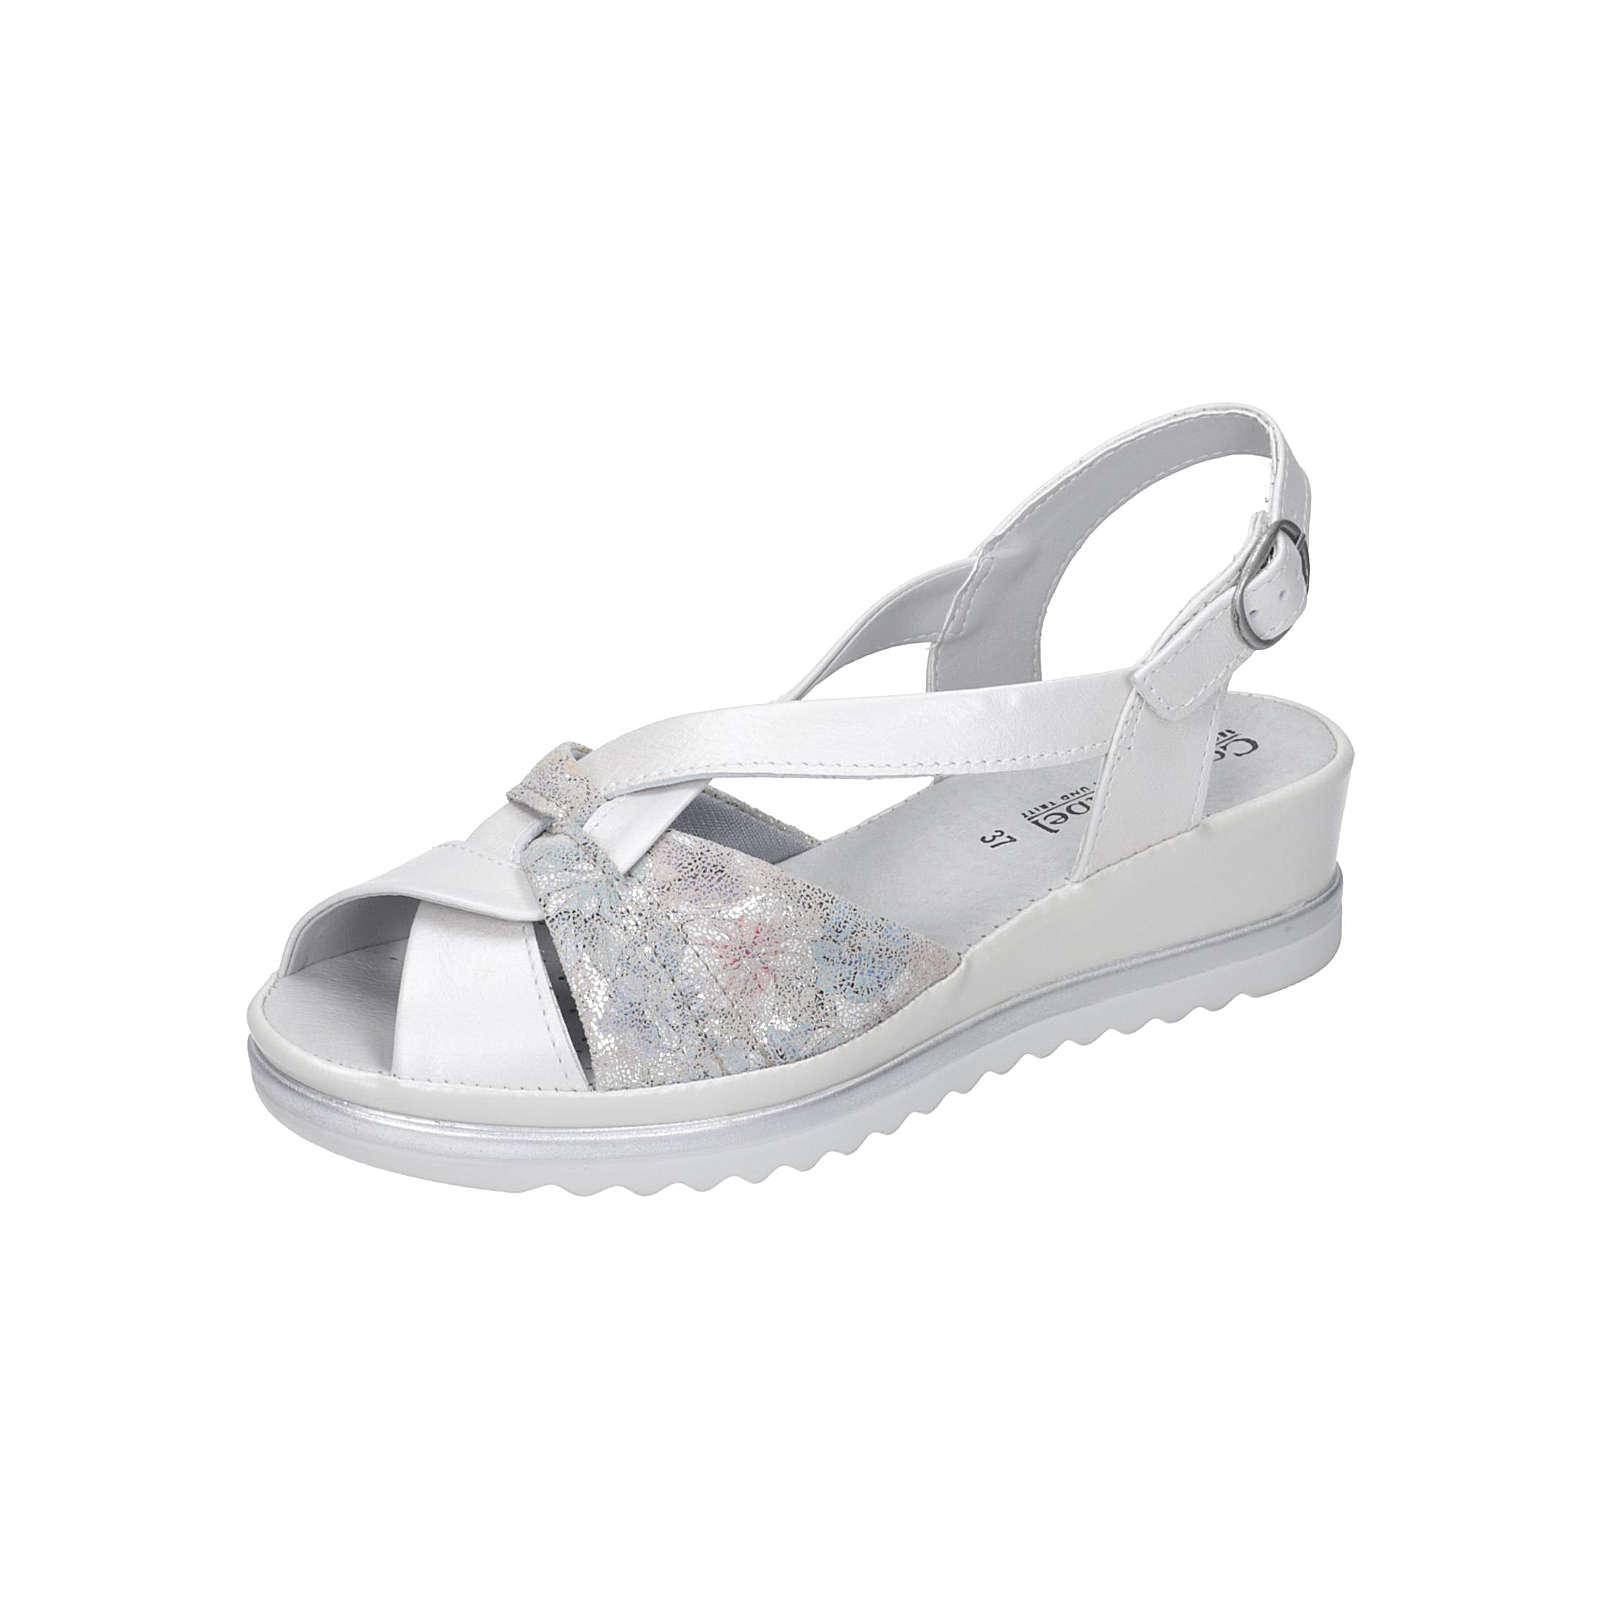 Comfortabel Damen Sandale Komfort-Sandalen weiß Damen Gr. 40